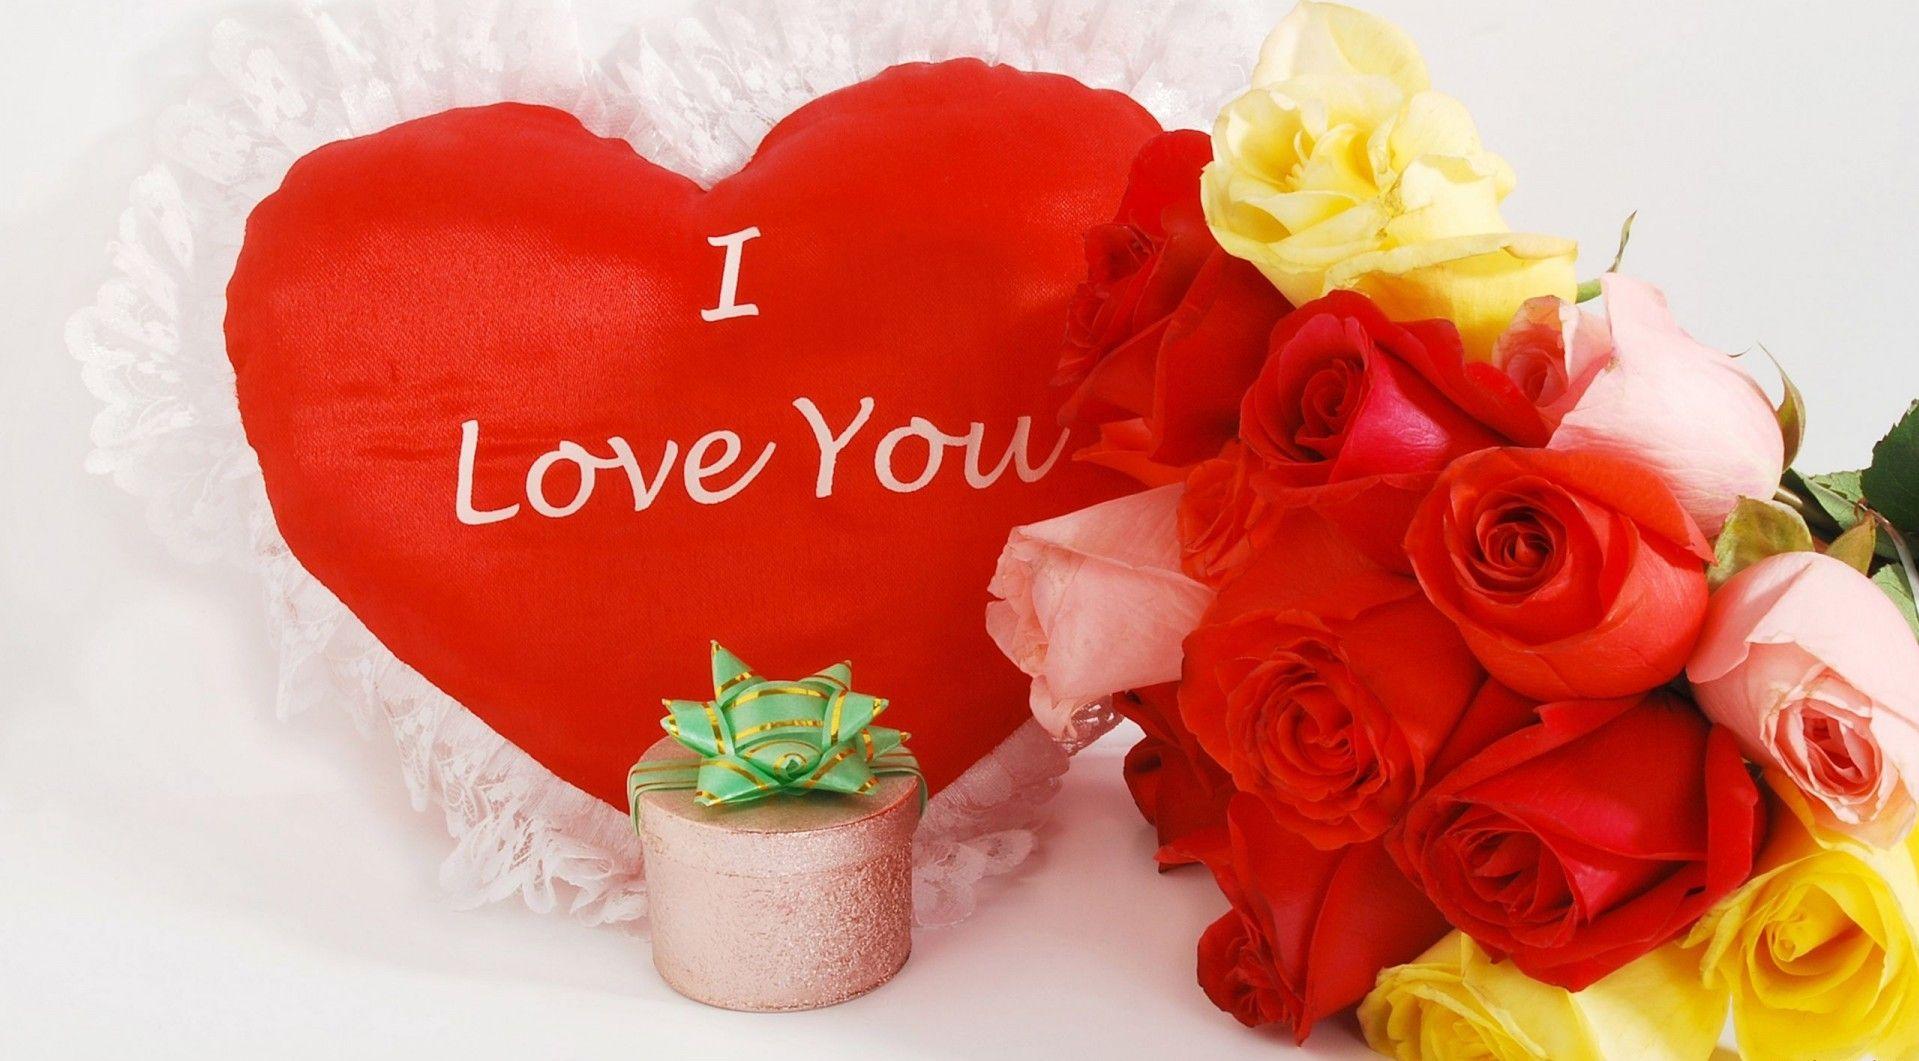 I Love You Wallpaper Love Wallpaper Download Full Hd Love Wallpaper Flower Images Wallpapers